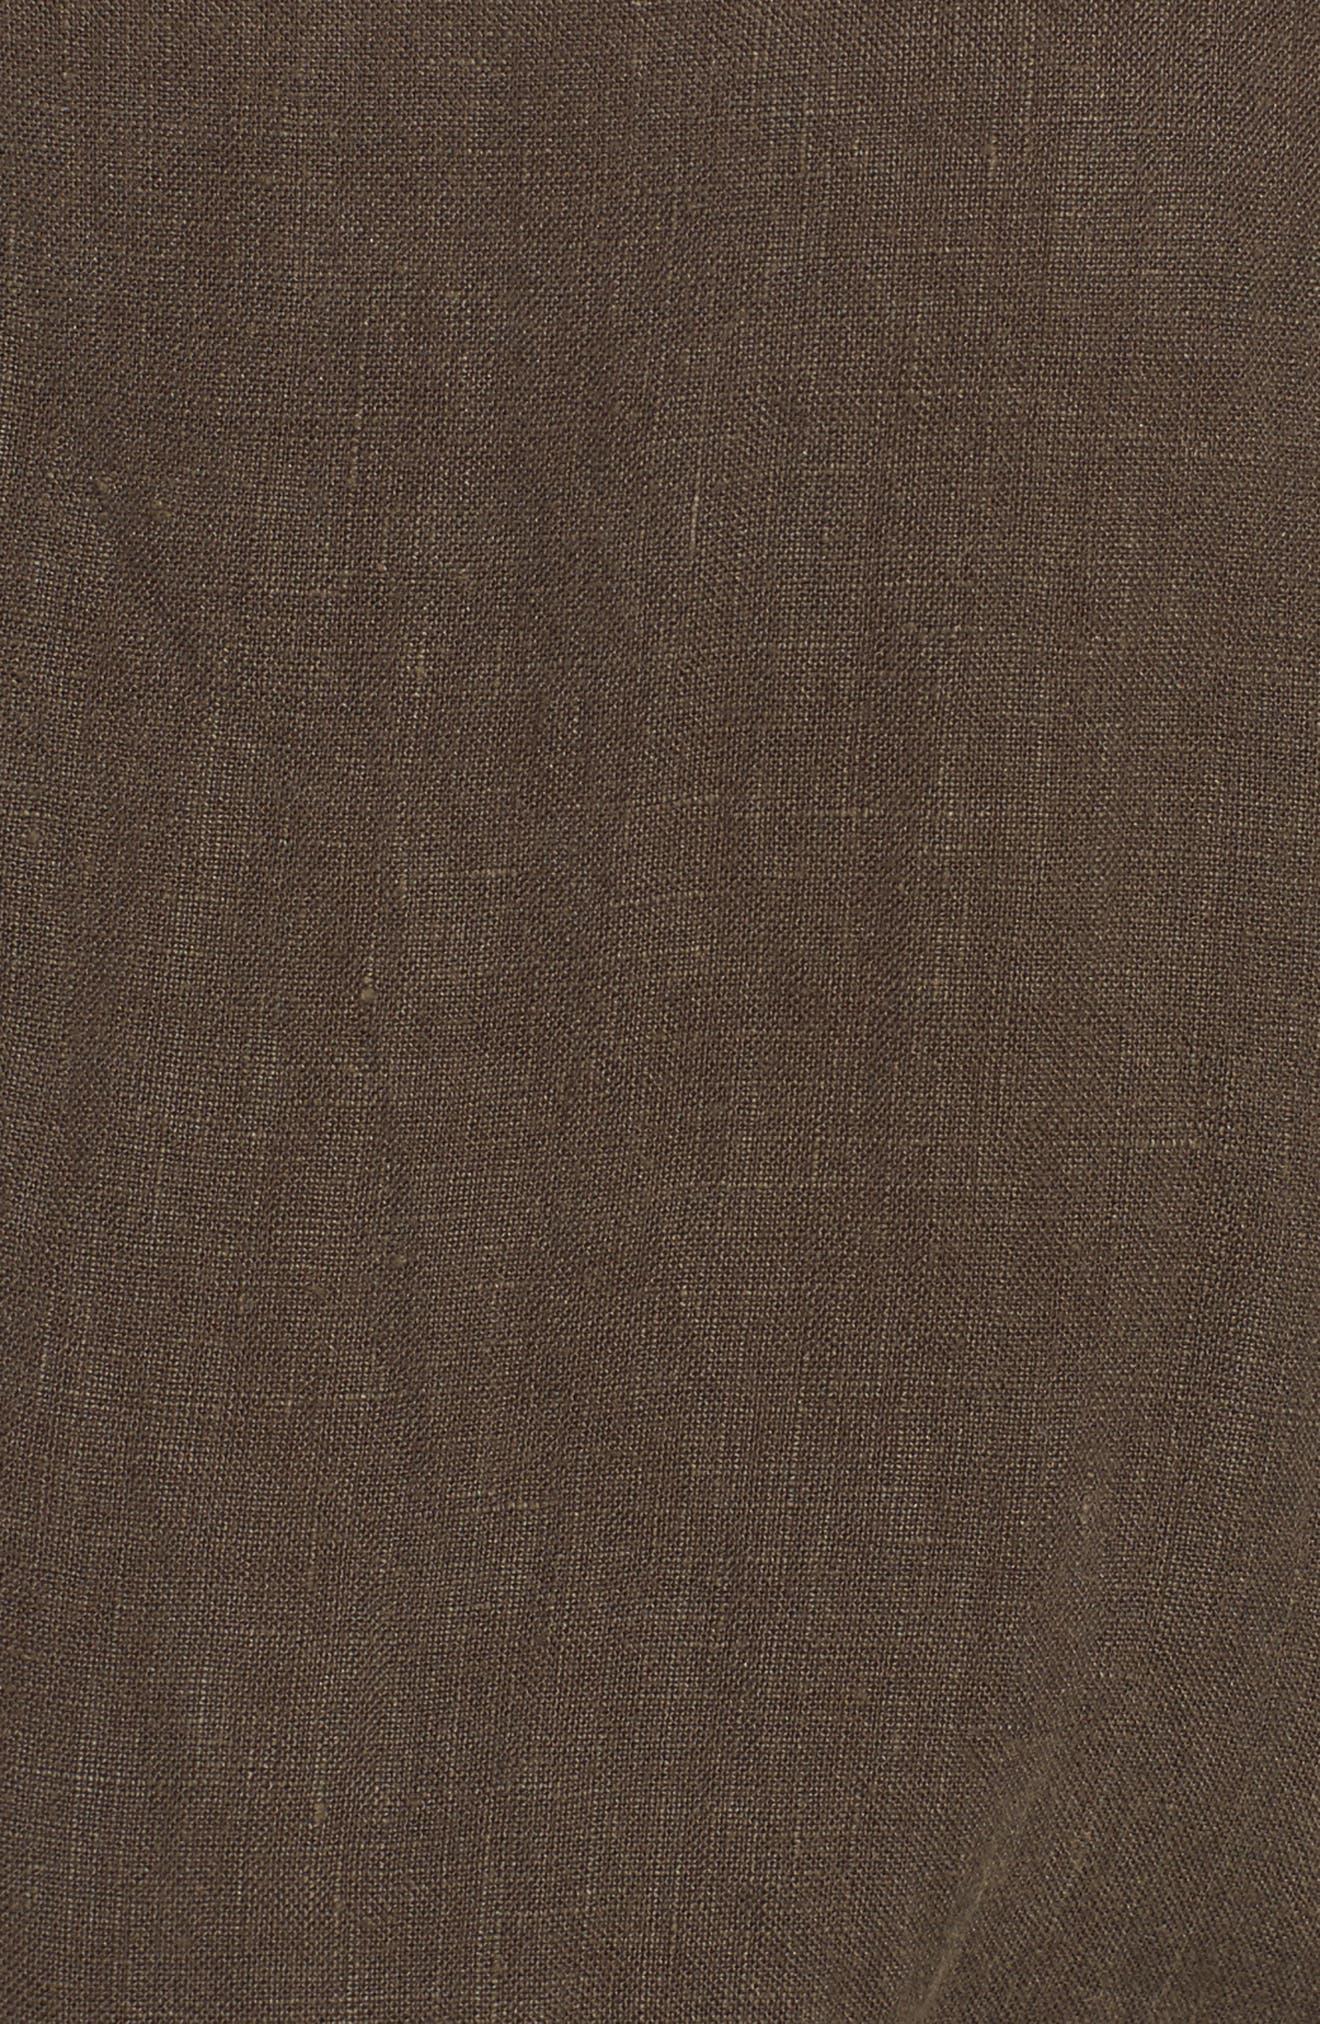 Linen Drawstring Shirtdress,                             Alternate thumbnail 5, color,                             337